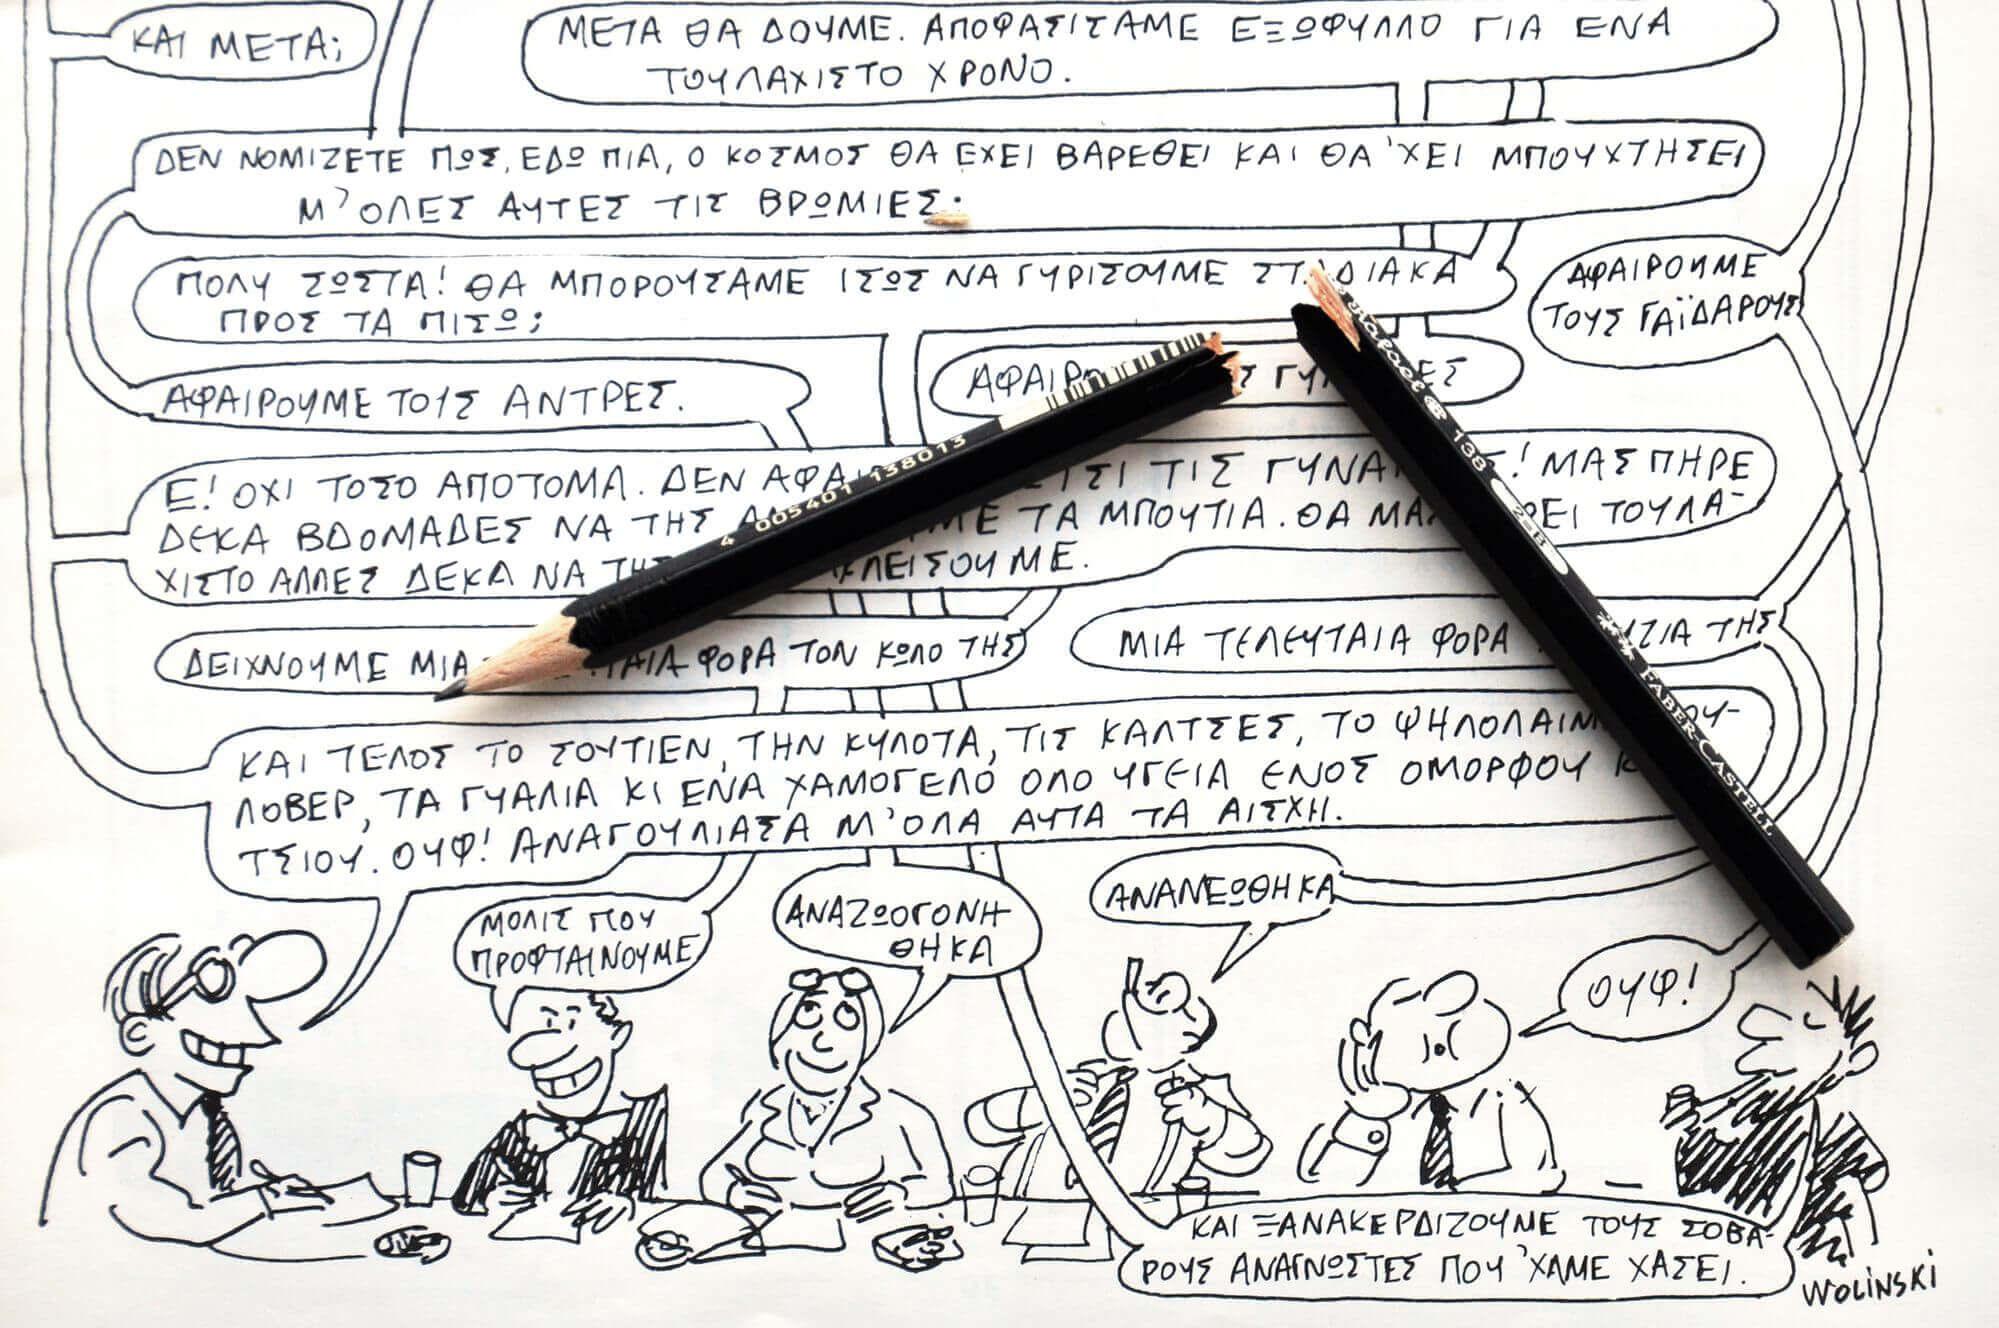 Jasa Ilustrasi Karikatur Pembuatan Storyboard Gambar Komik Comic